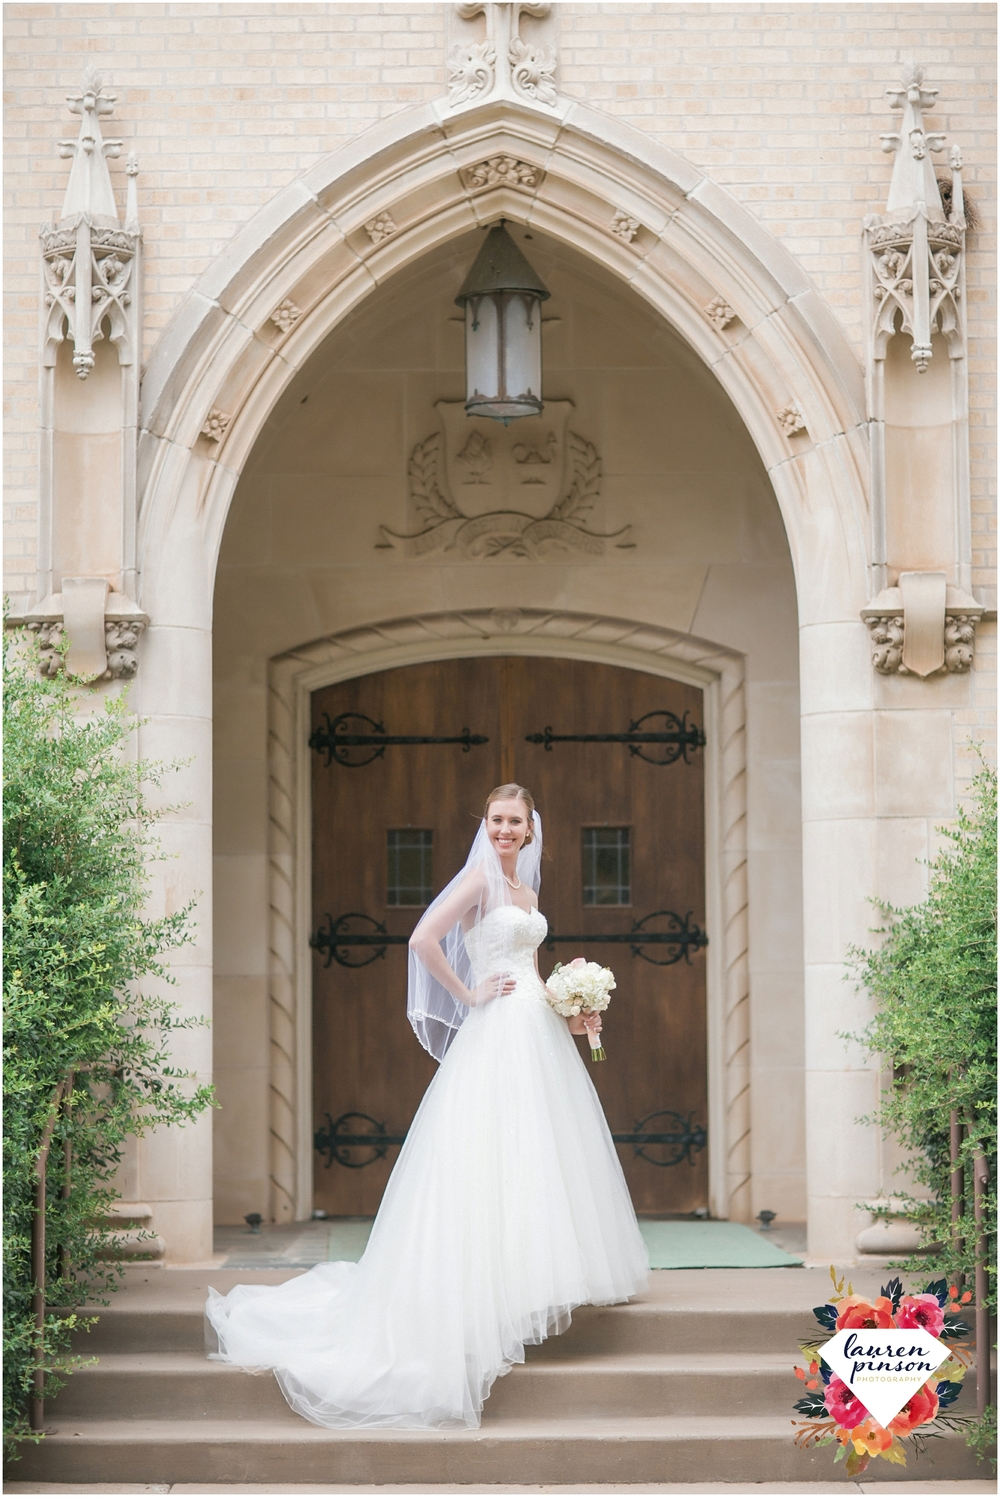 wichita-falls-wedding-photography-at-fain-presbyterian-church-and-the-wellington-timeless-classic-modern-photographer_1125.jpg